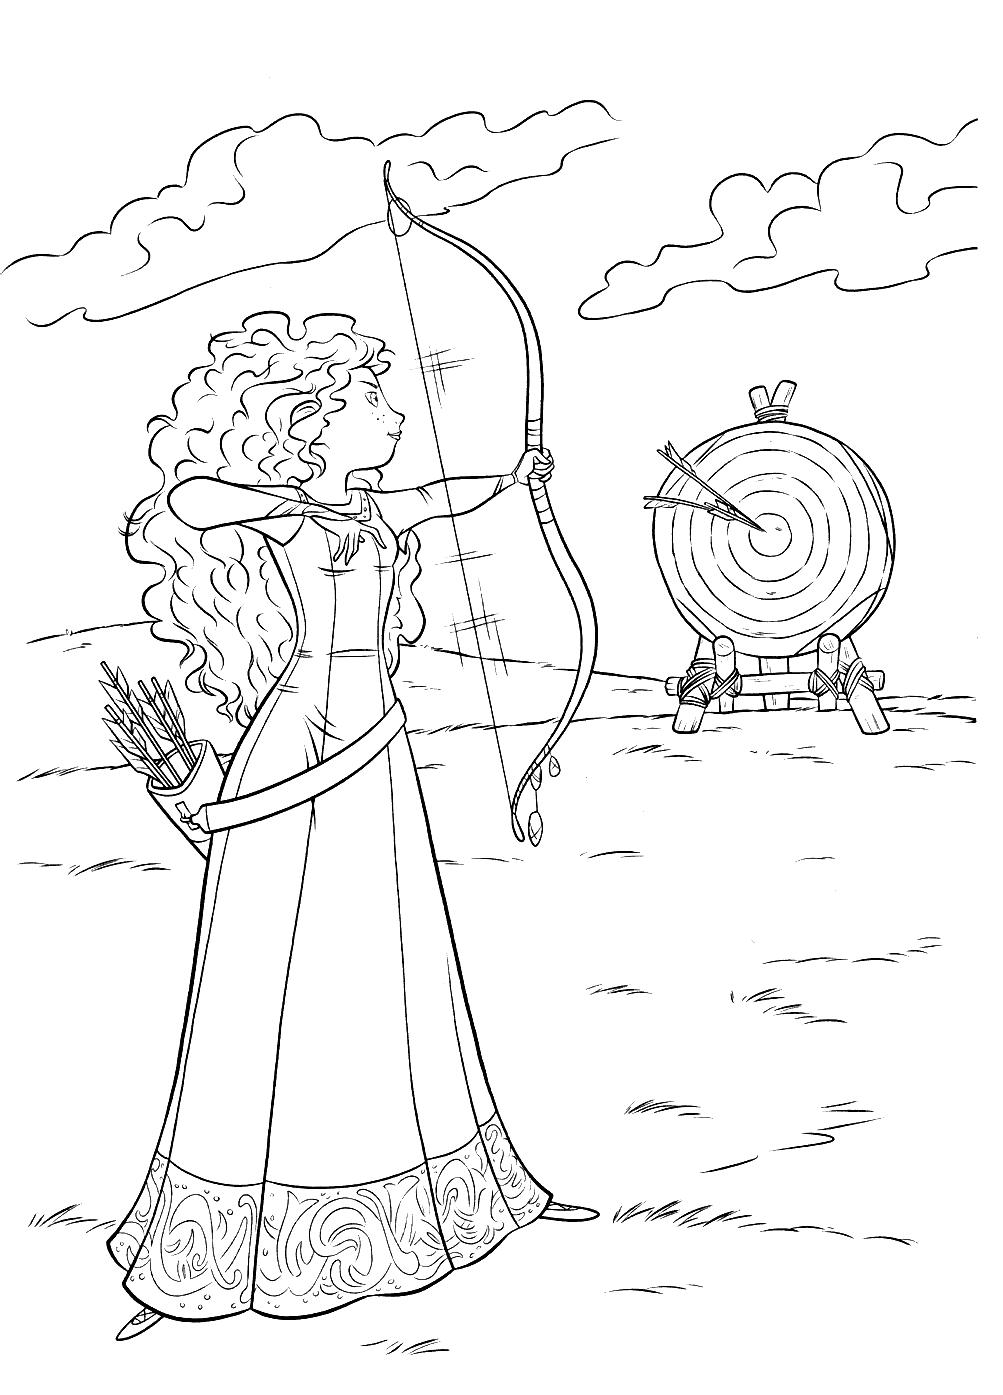 m229larbilder f246r barn prinsessan merida